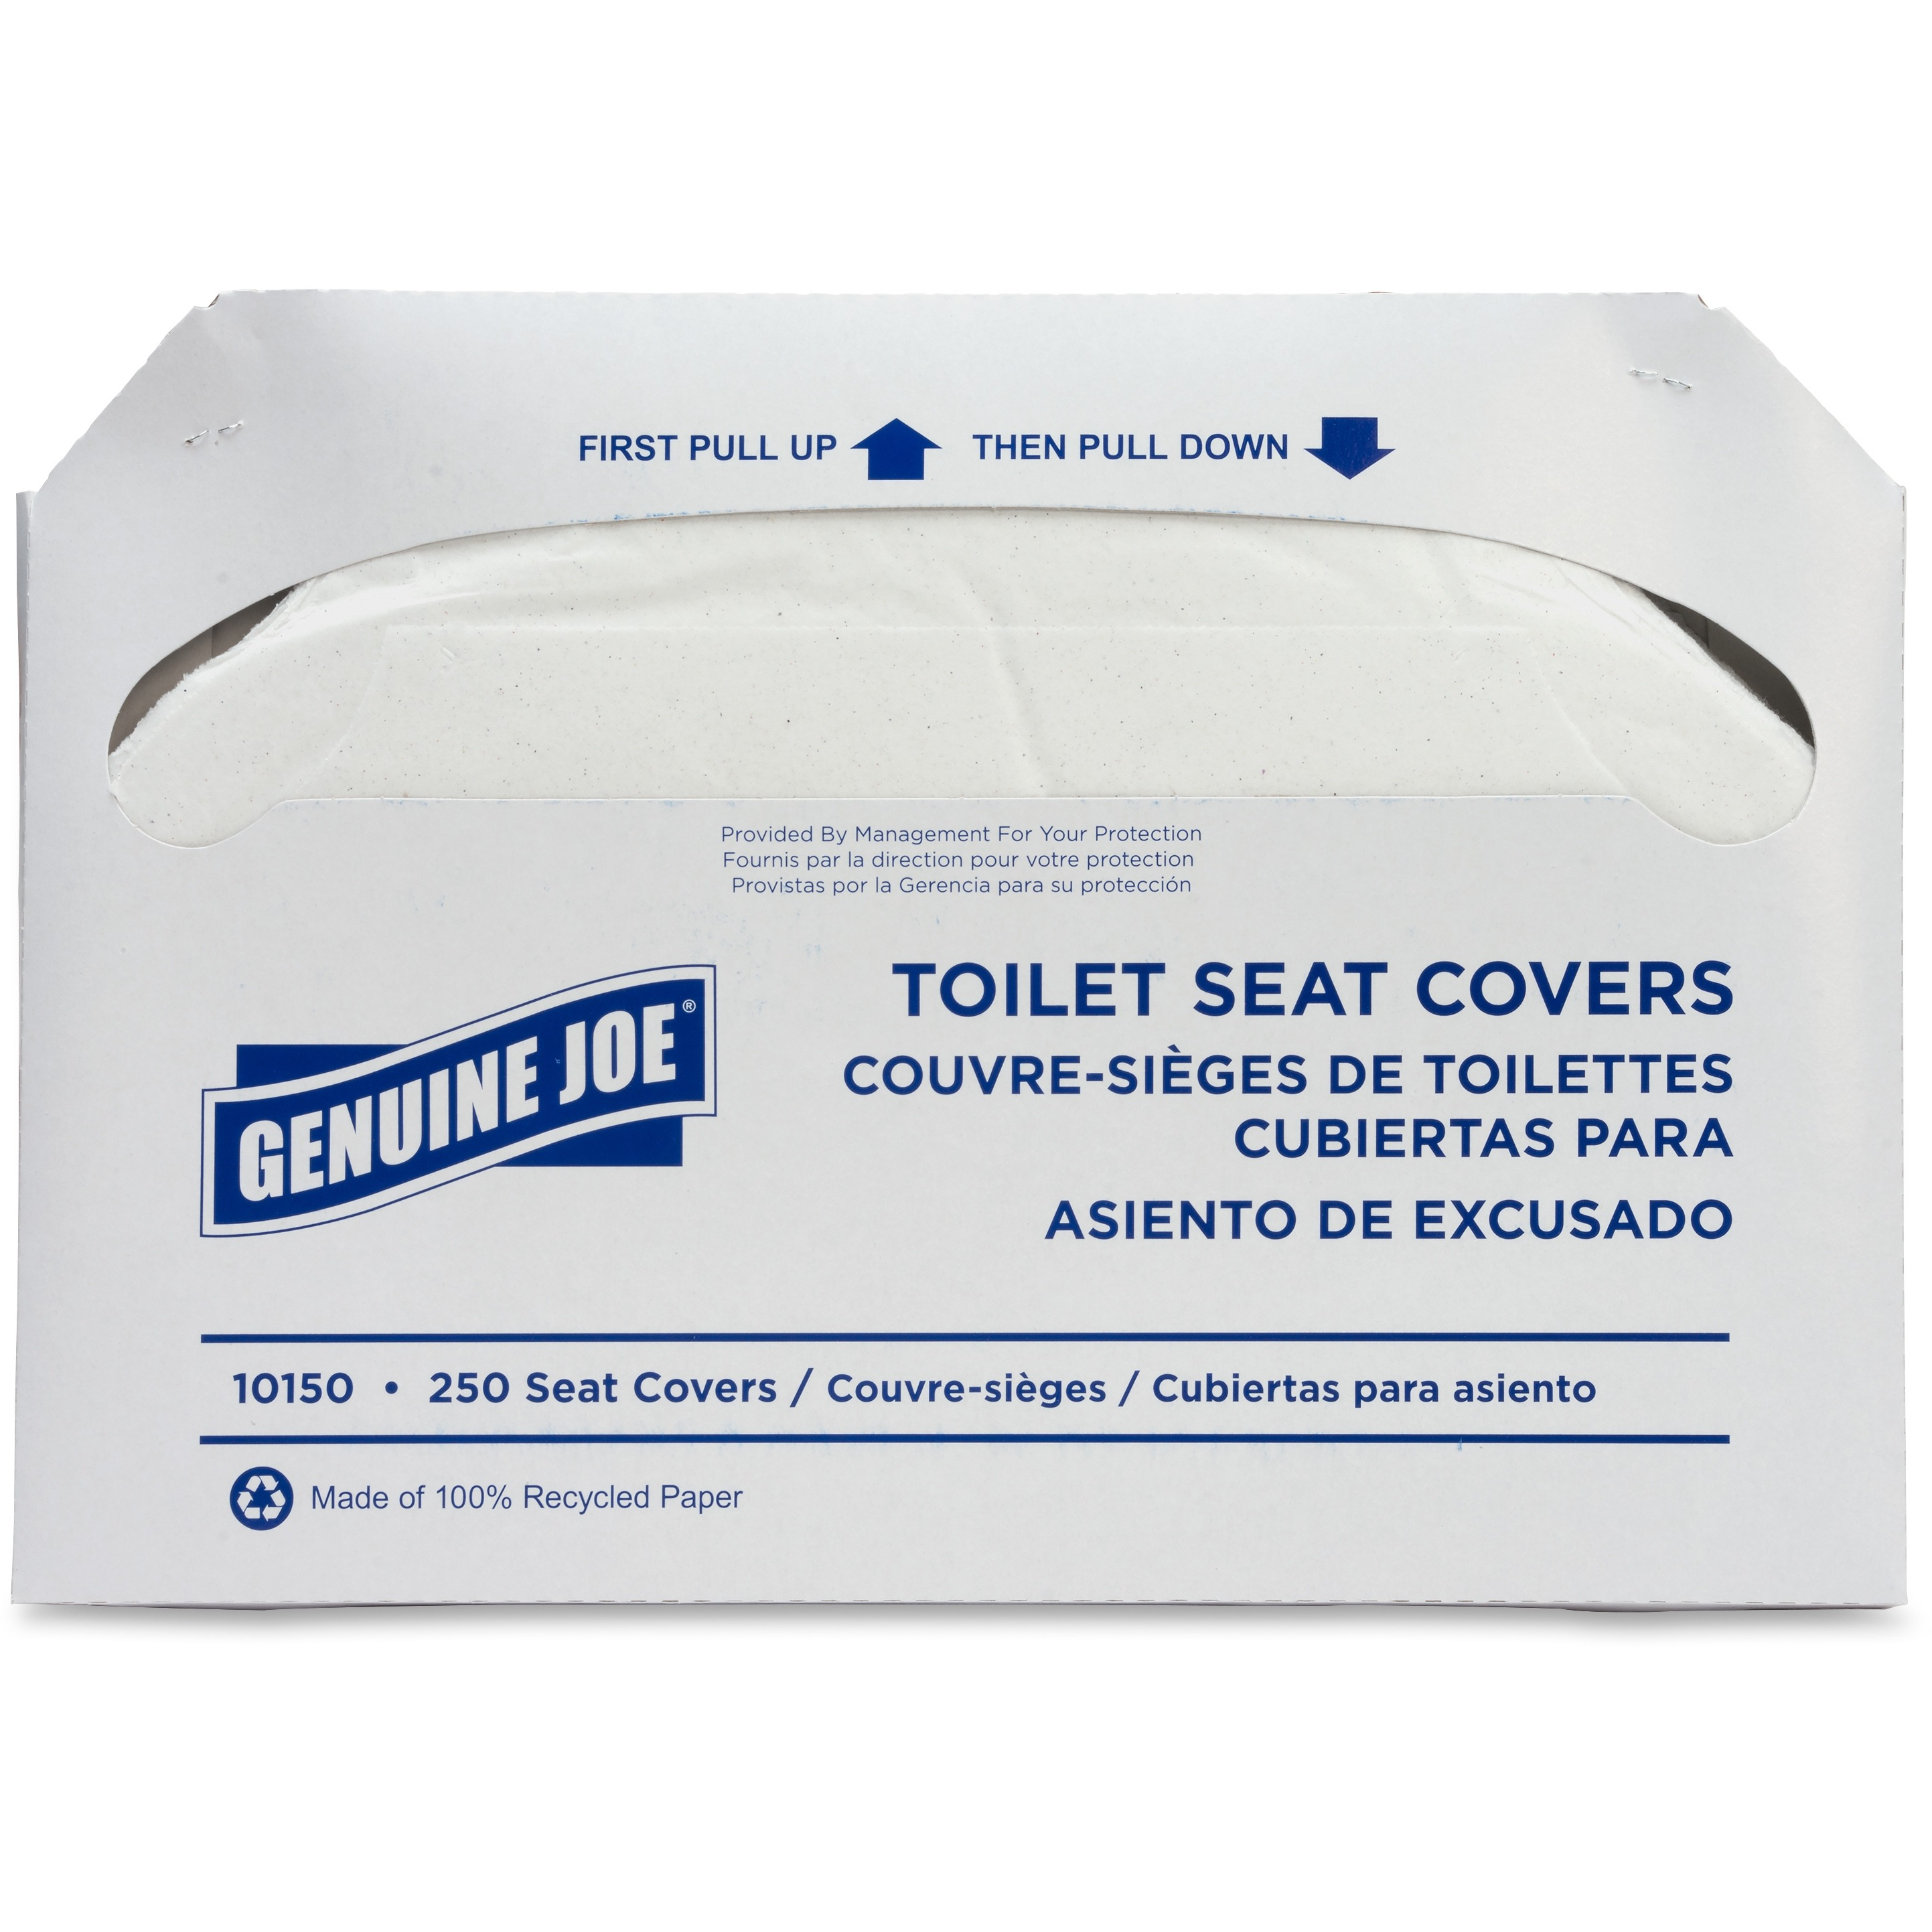 Genuine Joe Toilet Seat Covers